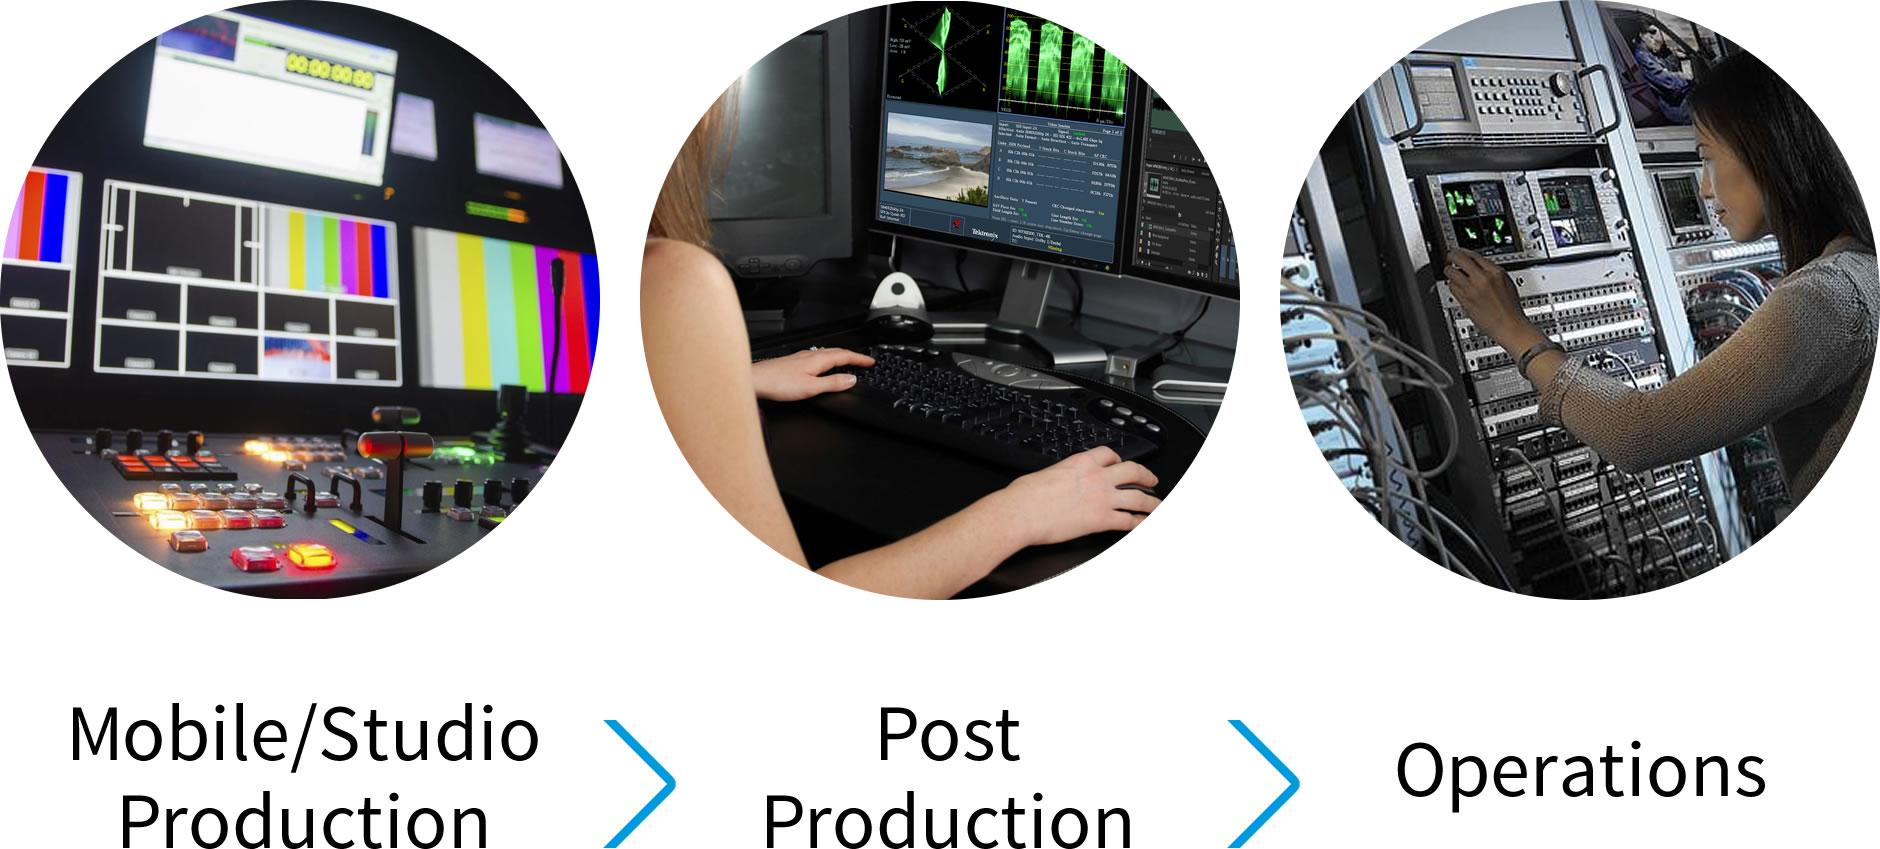 Video Test and Monitoring Equipment   Telestream